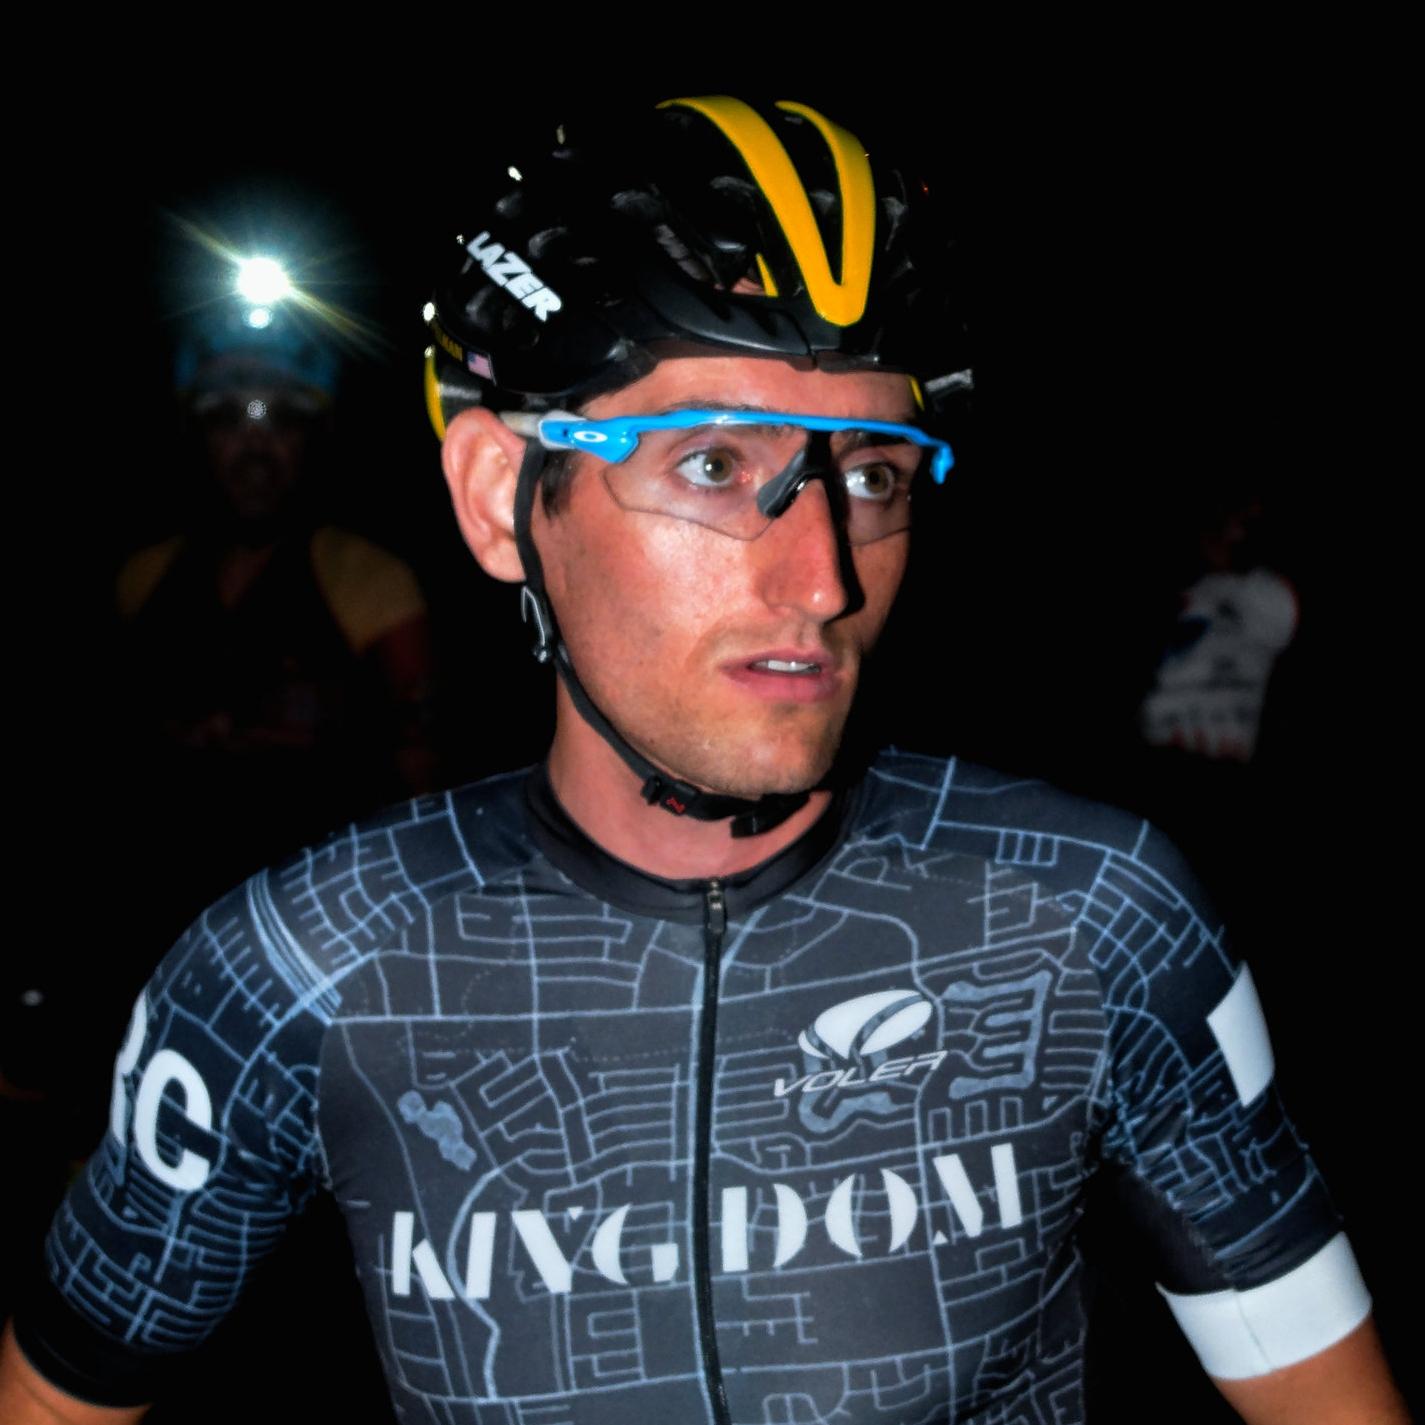 Jake Spelman - 24 years oldLighting SalesmanCat. 2 Road Cyclist for Bike Accident AttorneysFrom Gilbert, AZ.